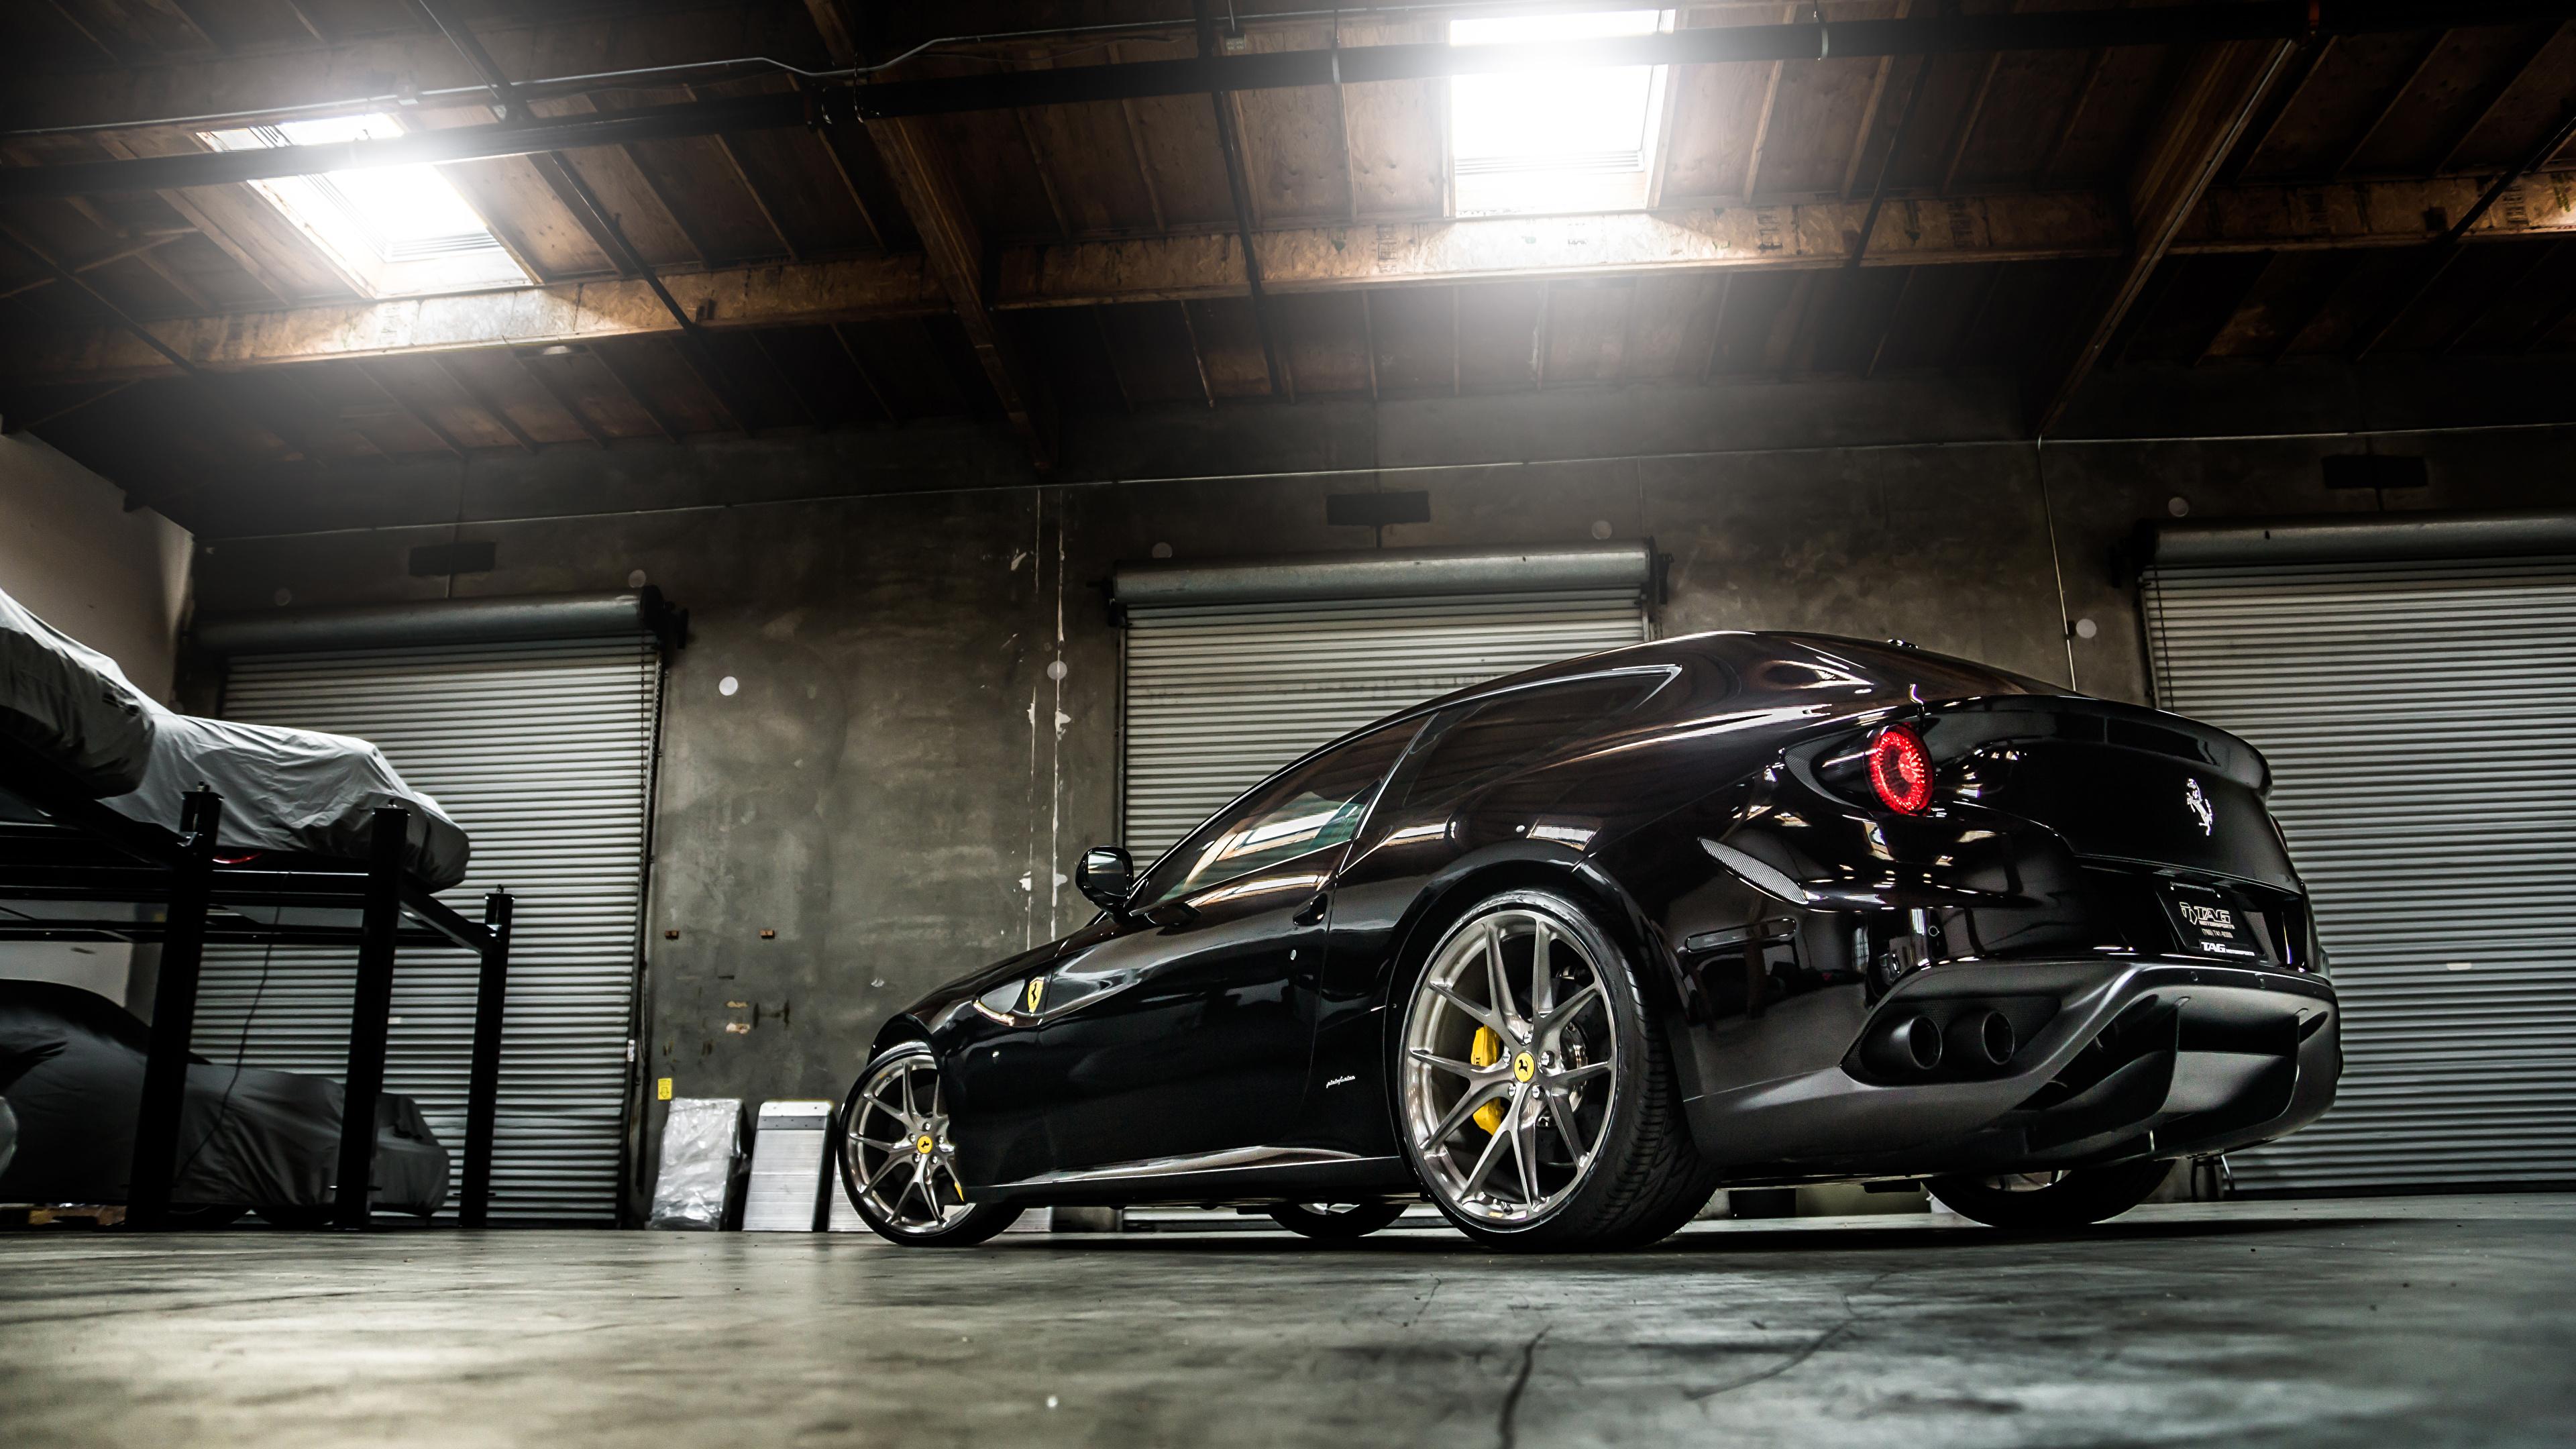 Image Ferrari Ff Black Cars 3840x2160